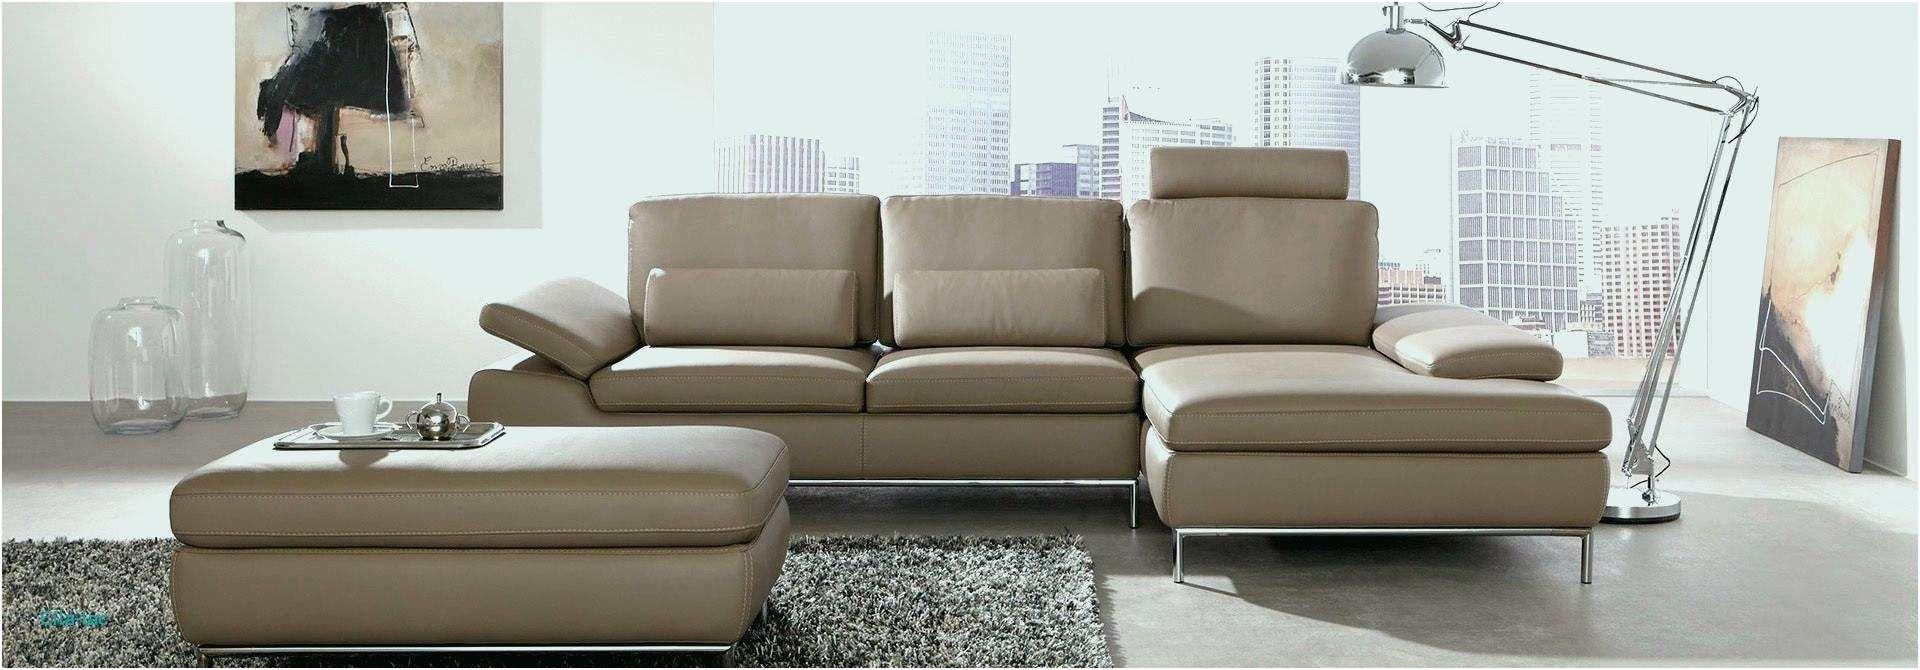 Fantastisch Segmuller Sofa Angebot Home Decor Home Sofa